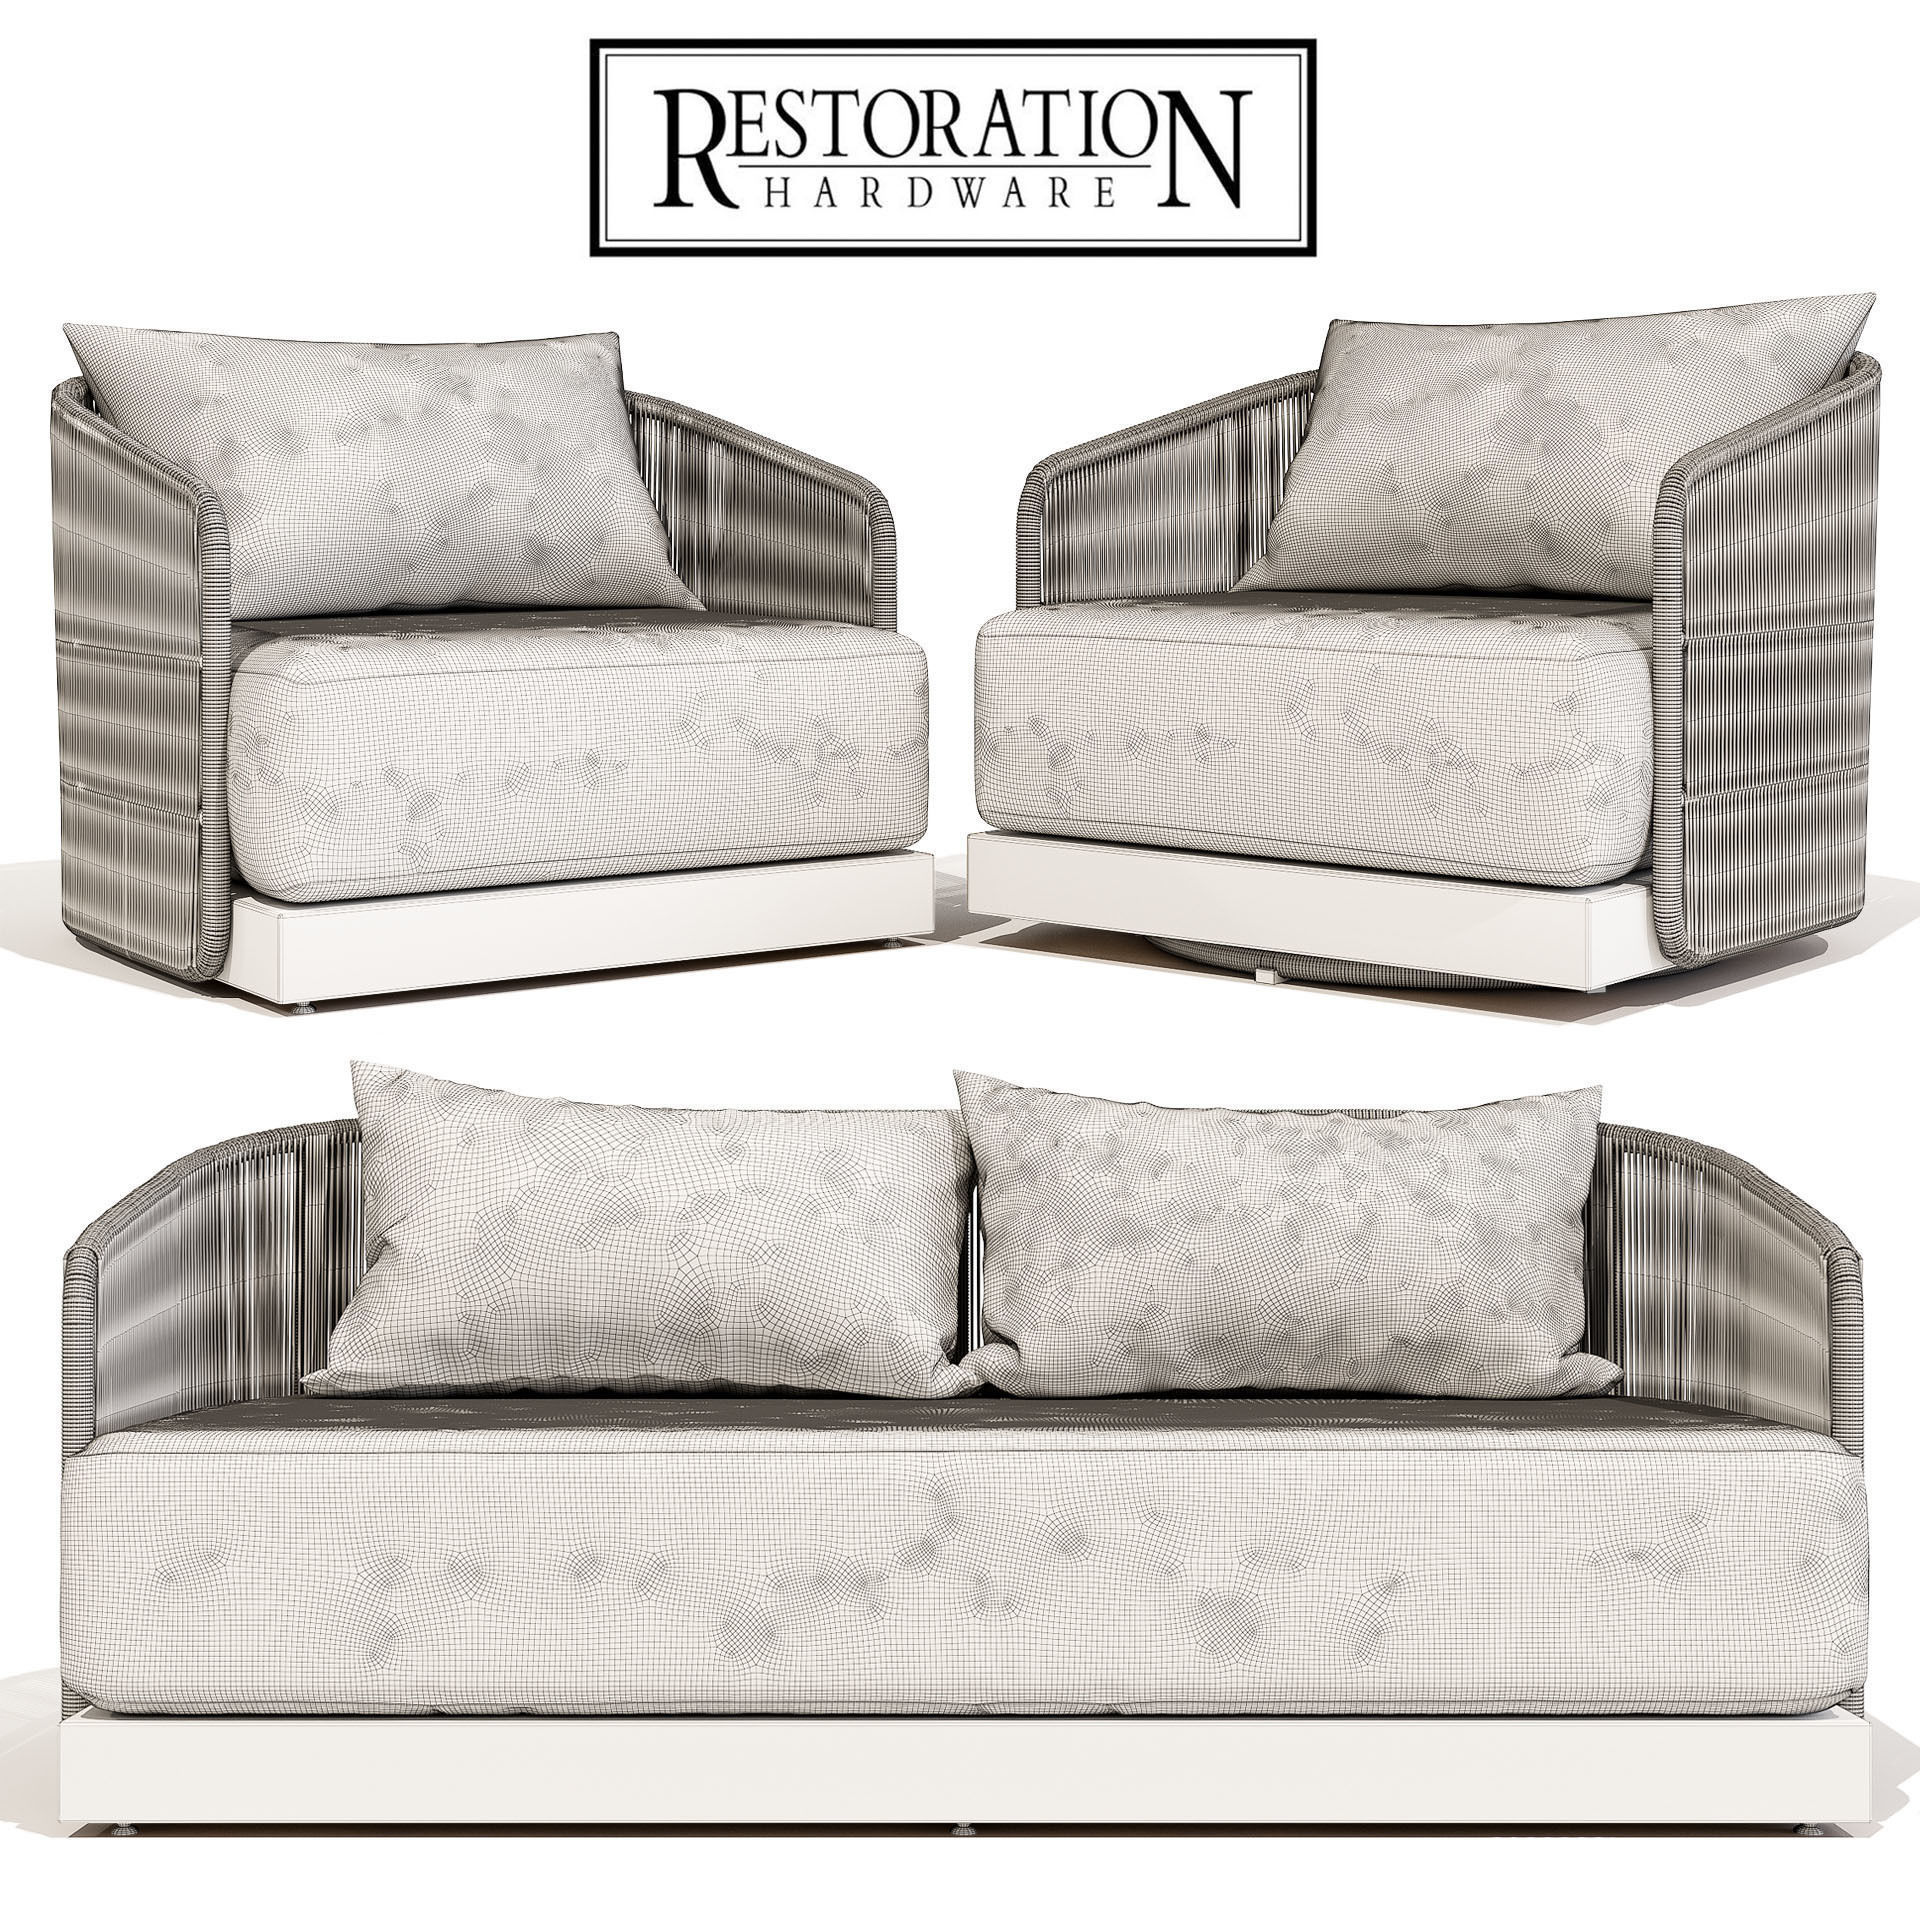 Restoration Hardware Havana Sofa 68 With Lounge And Swivel Chair Model Max Obj Mtl 2